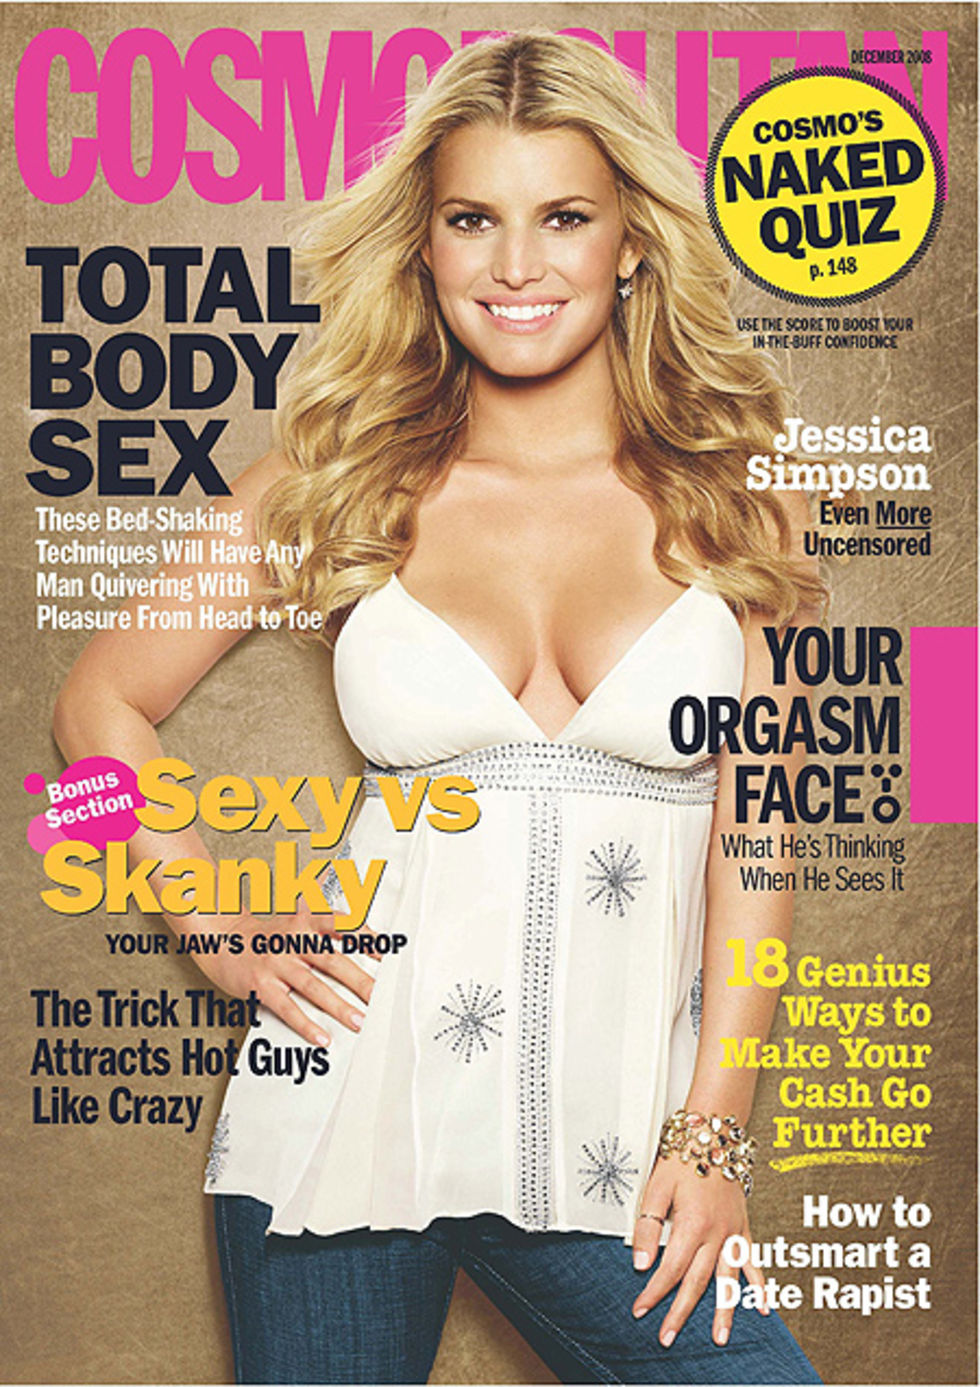 jessica-simpson-cosmopolitan-magazine-cover-december-2008-lq-01